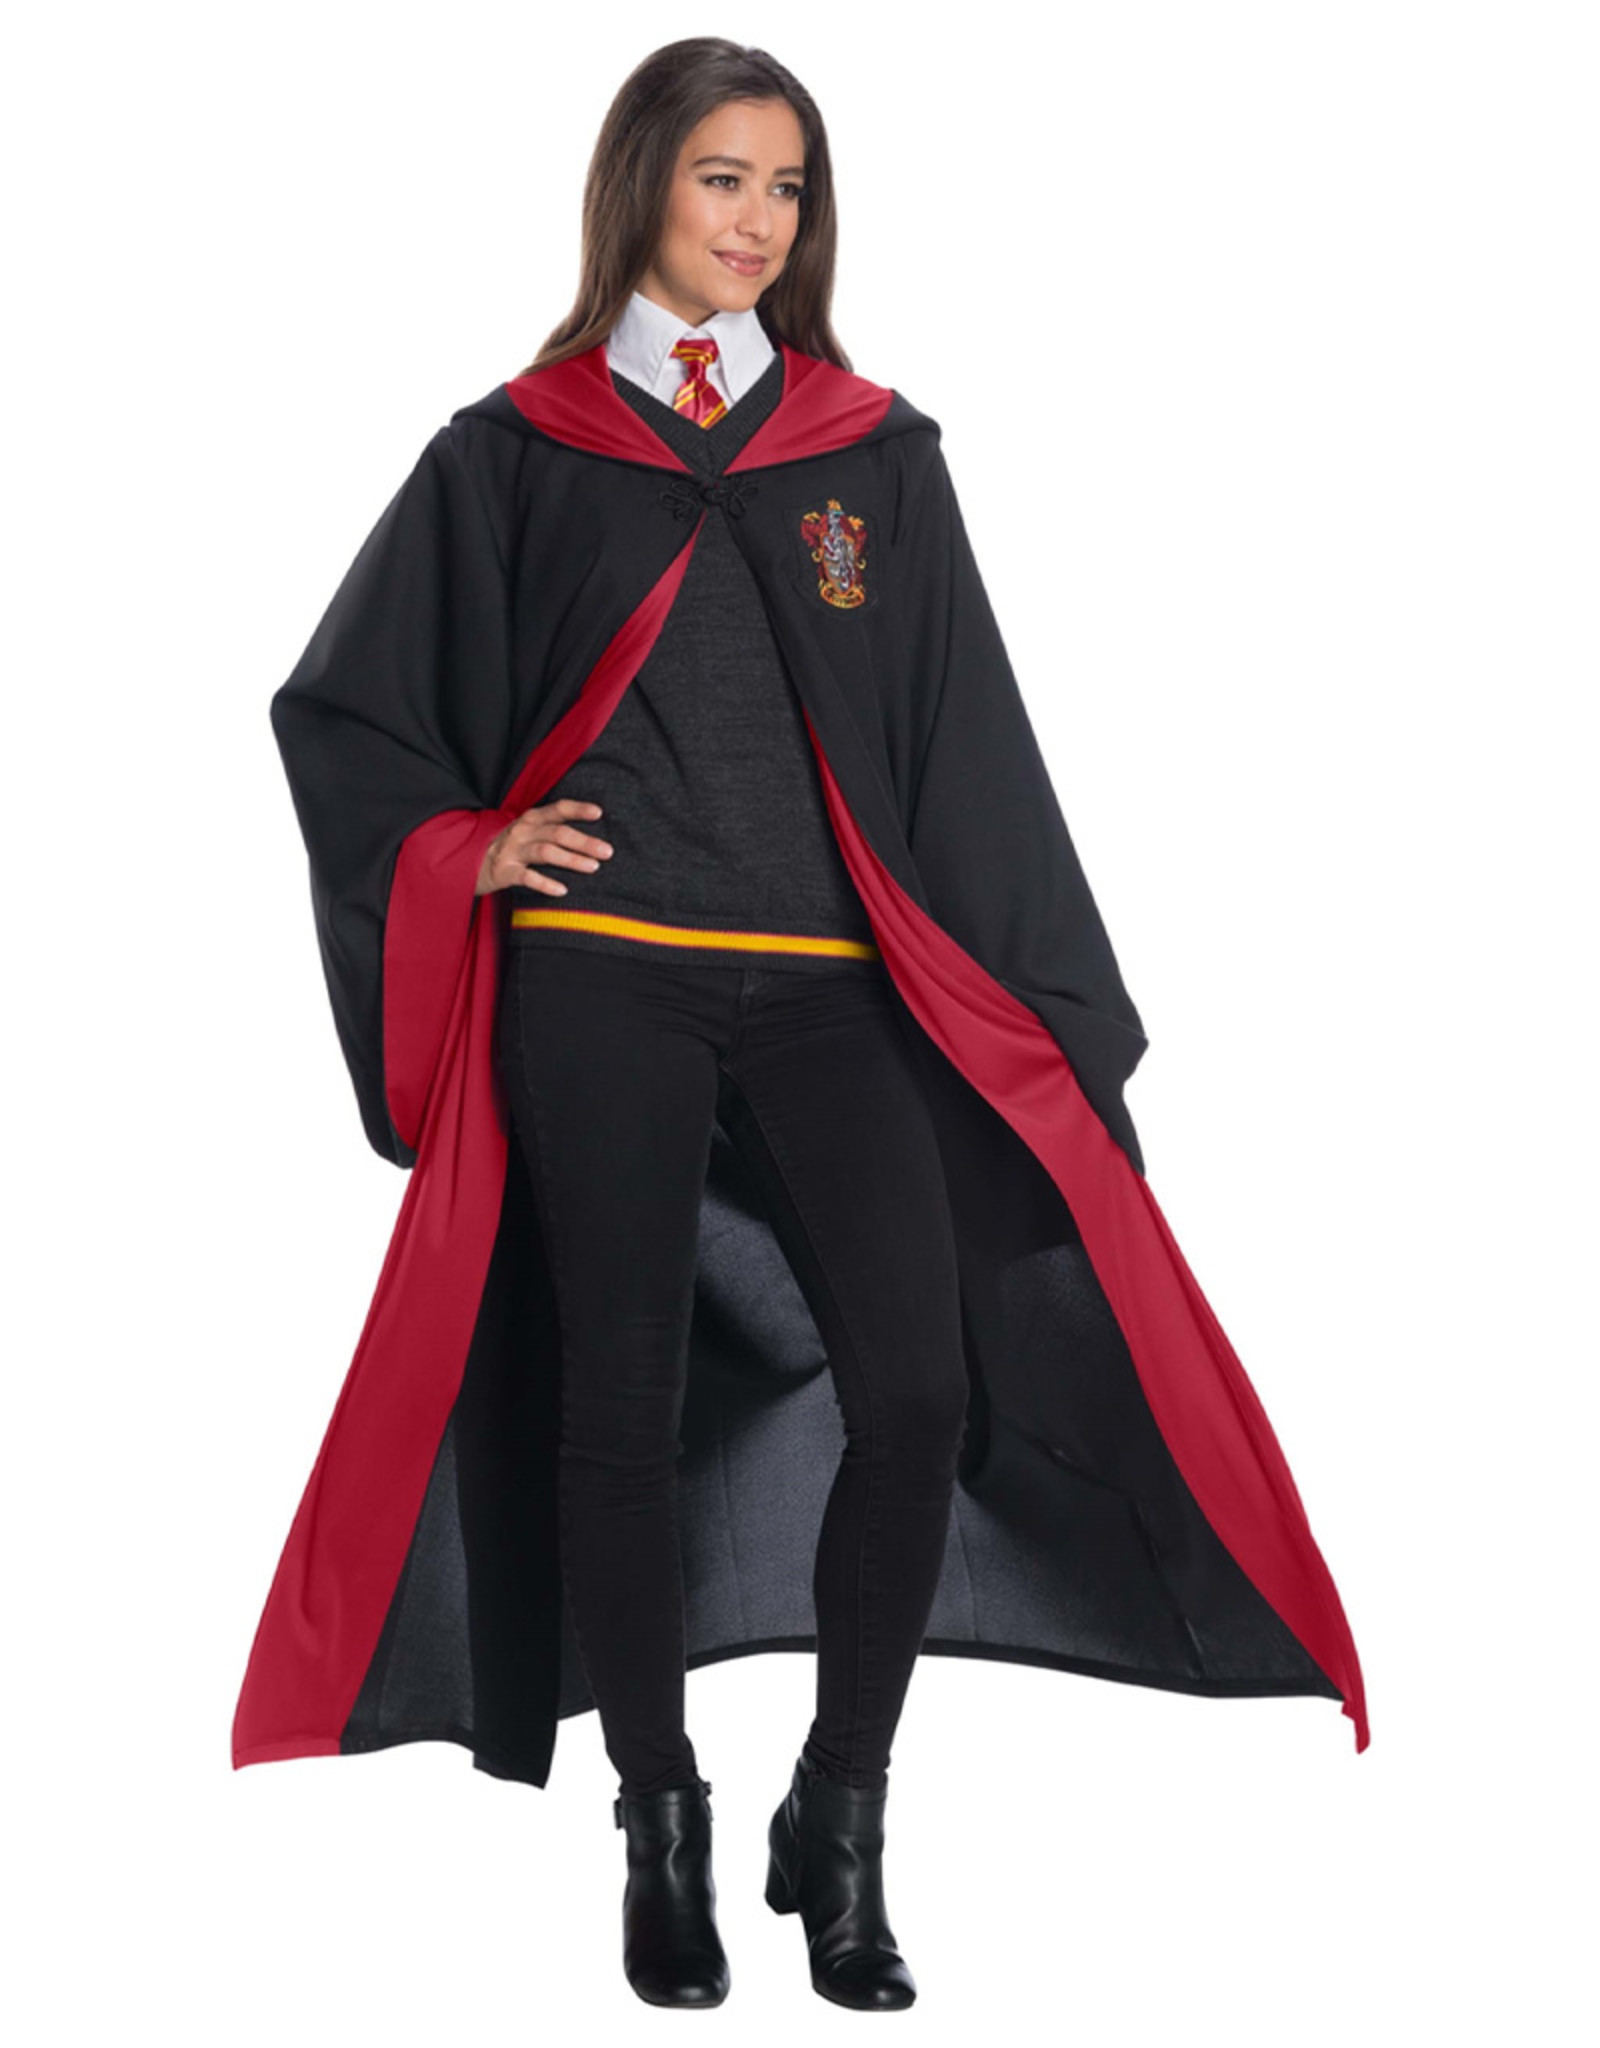 Gryffindor Student Costume - Harry Potter - Adult